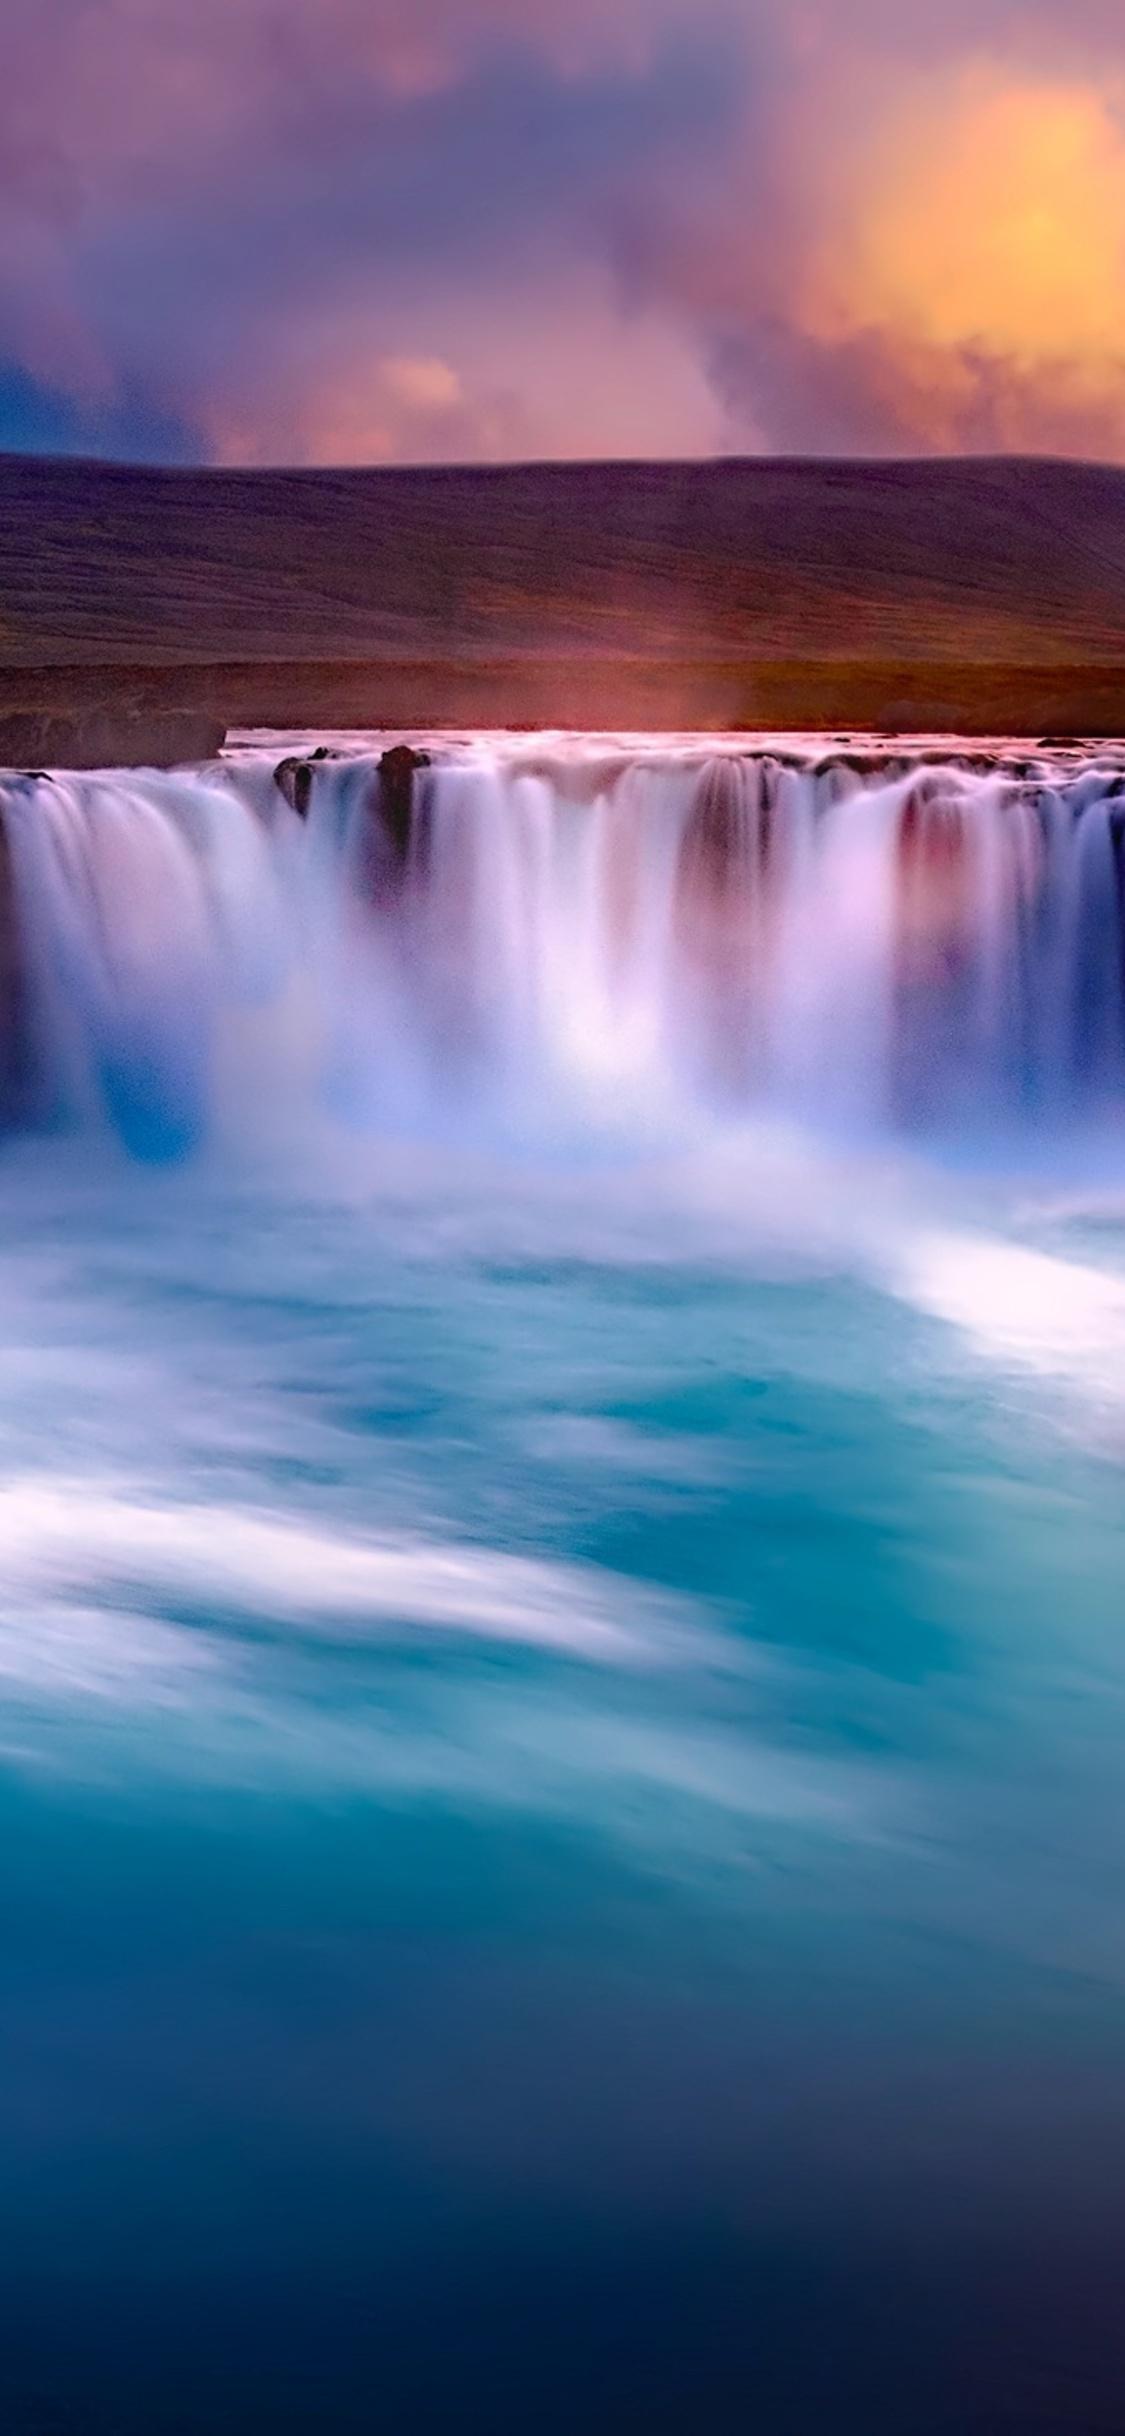 1125x2436 Gooafoss Iceland Waterfall Iphone Xs Iphone 10 Iphone X Hd